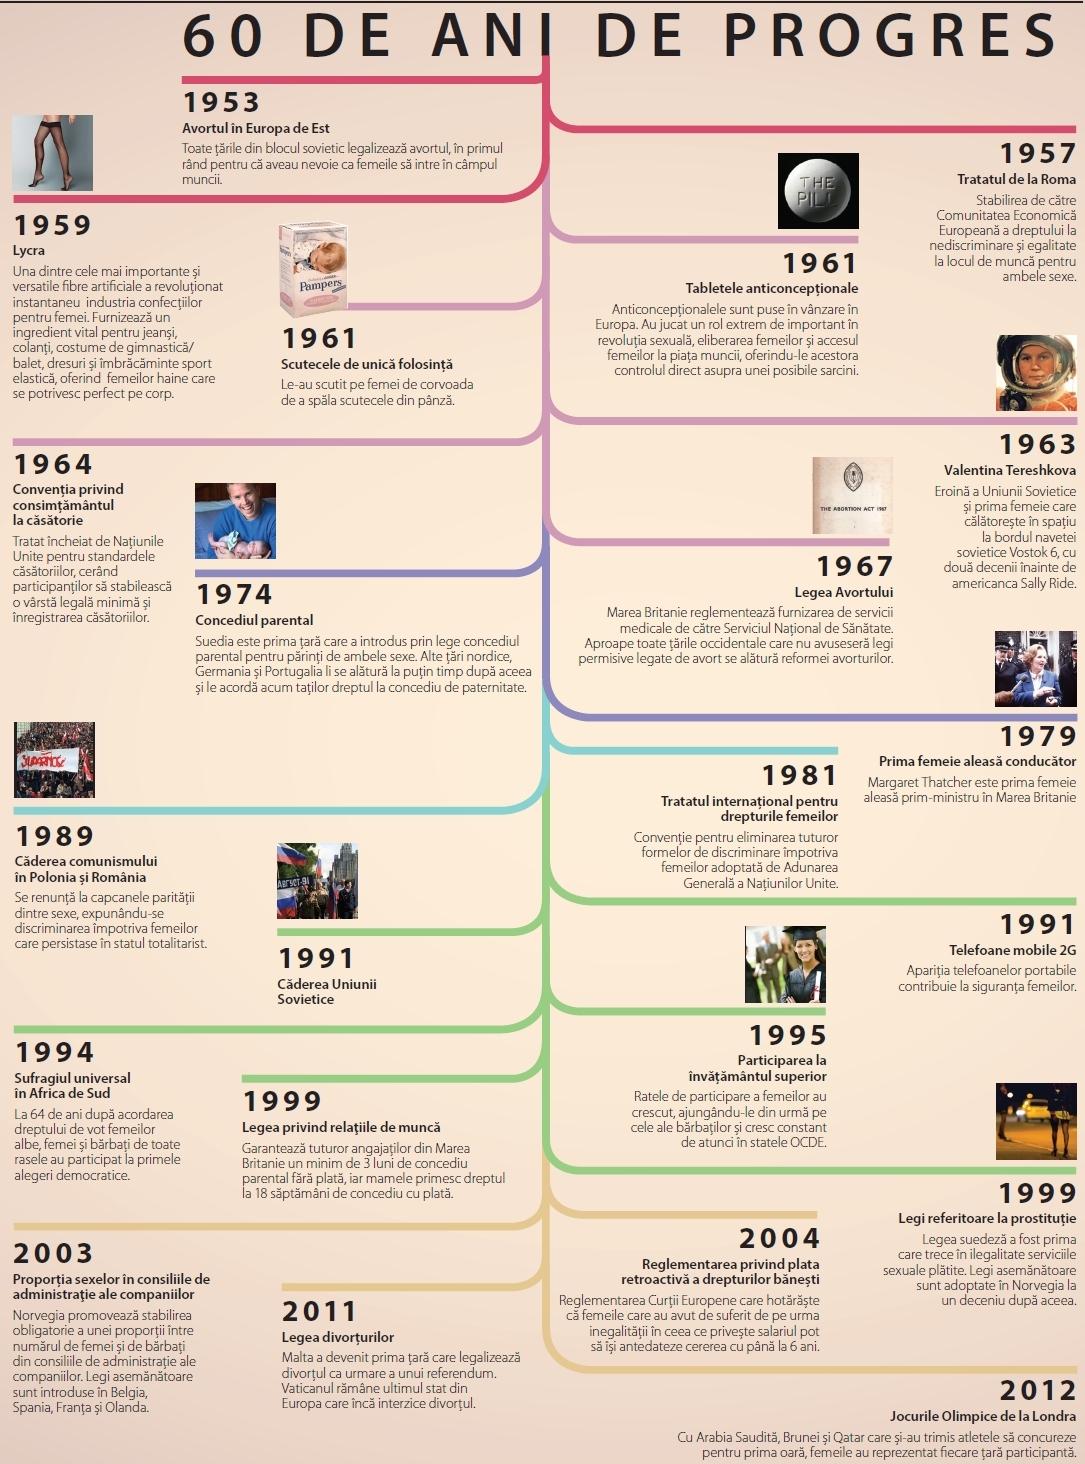 60 de ani de progres